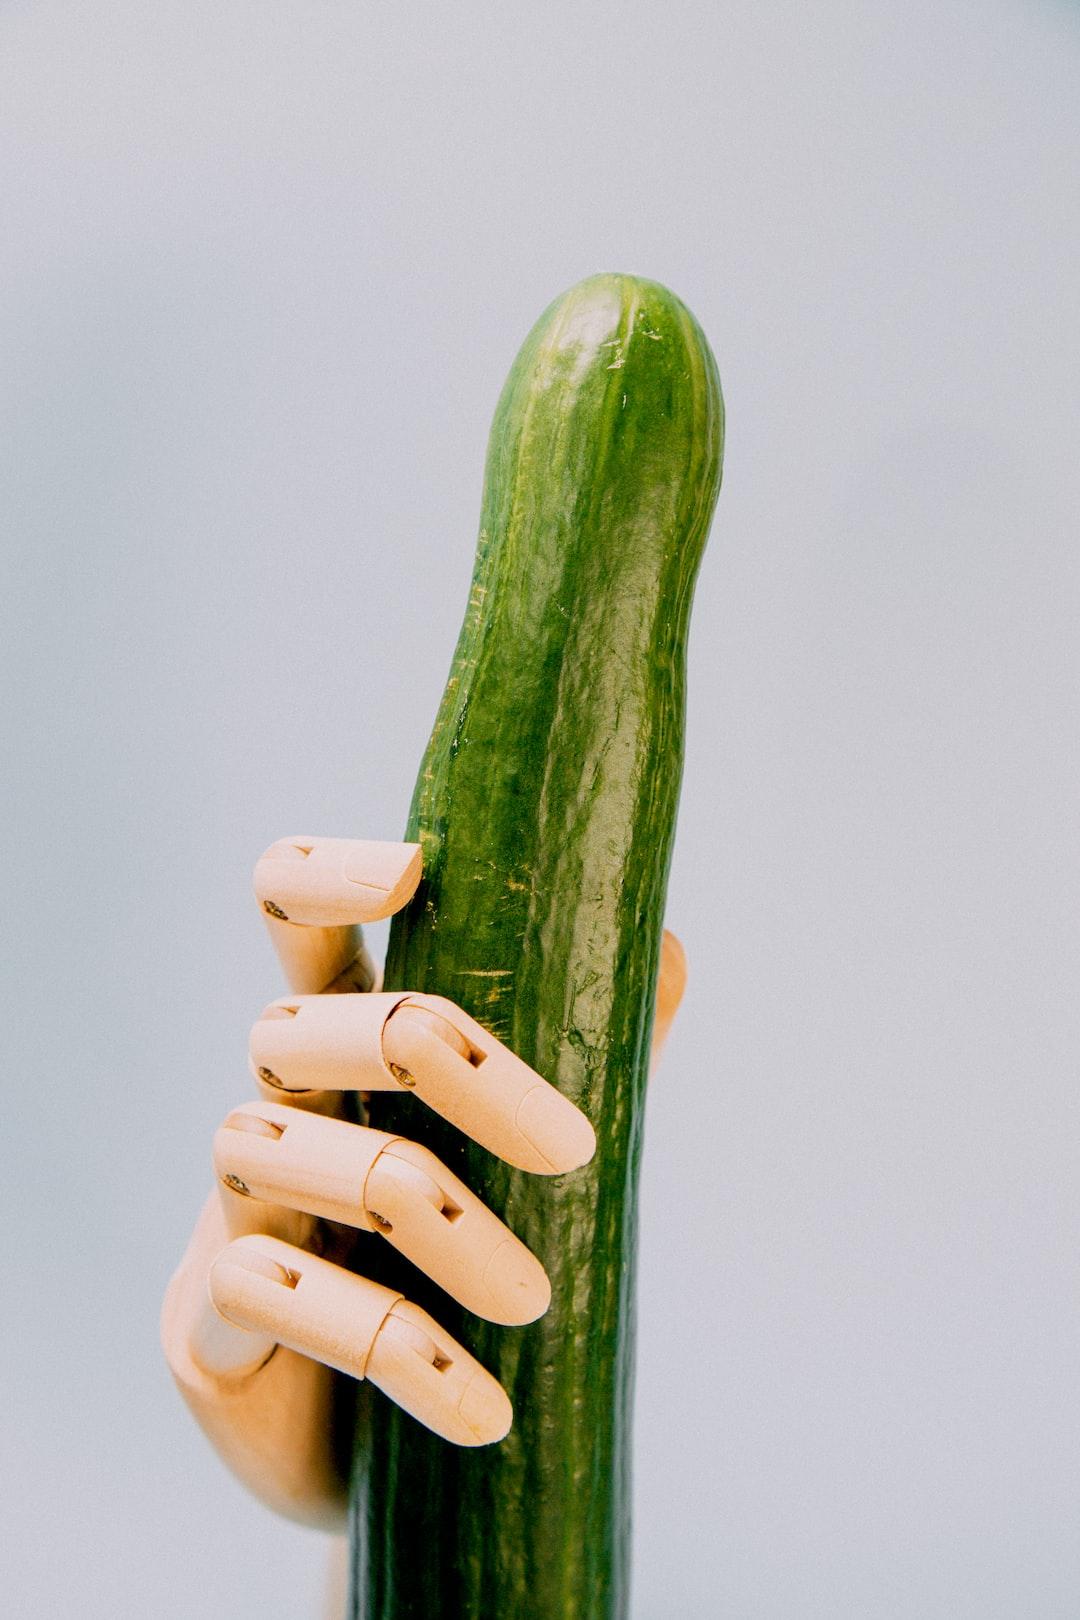 Unporn: Masturbation